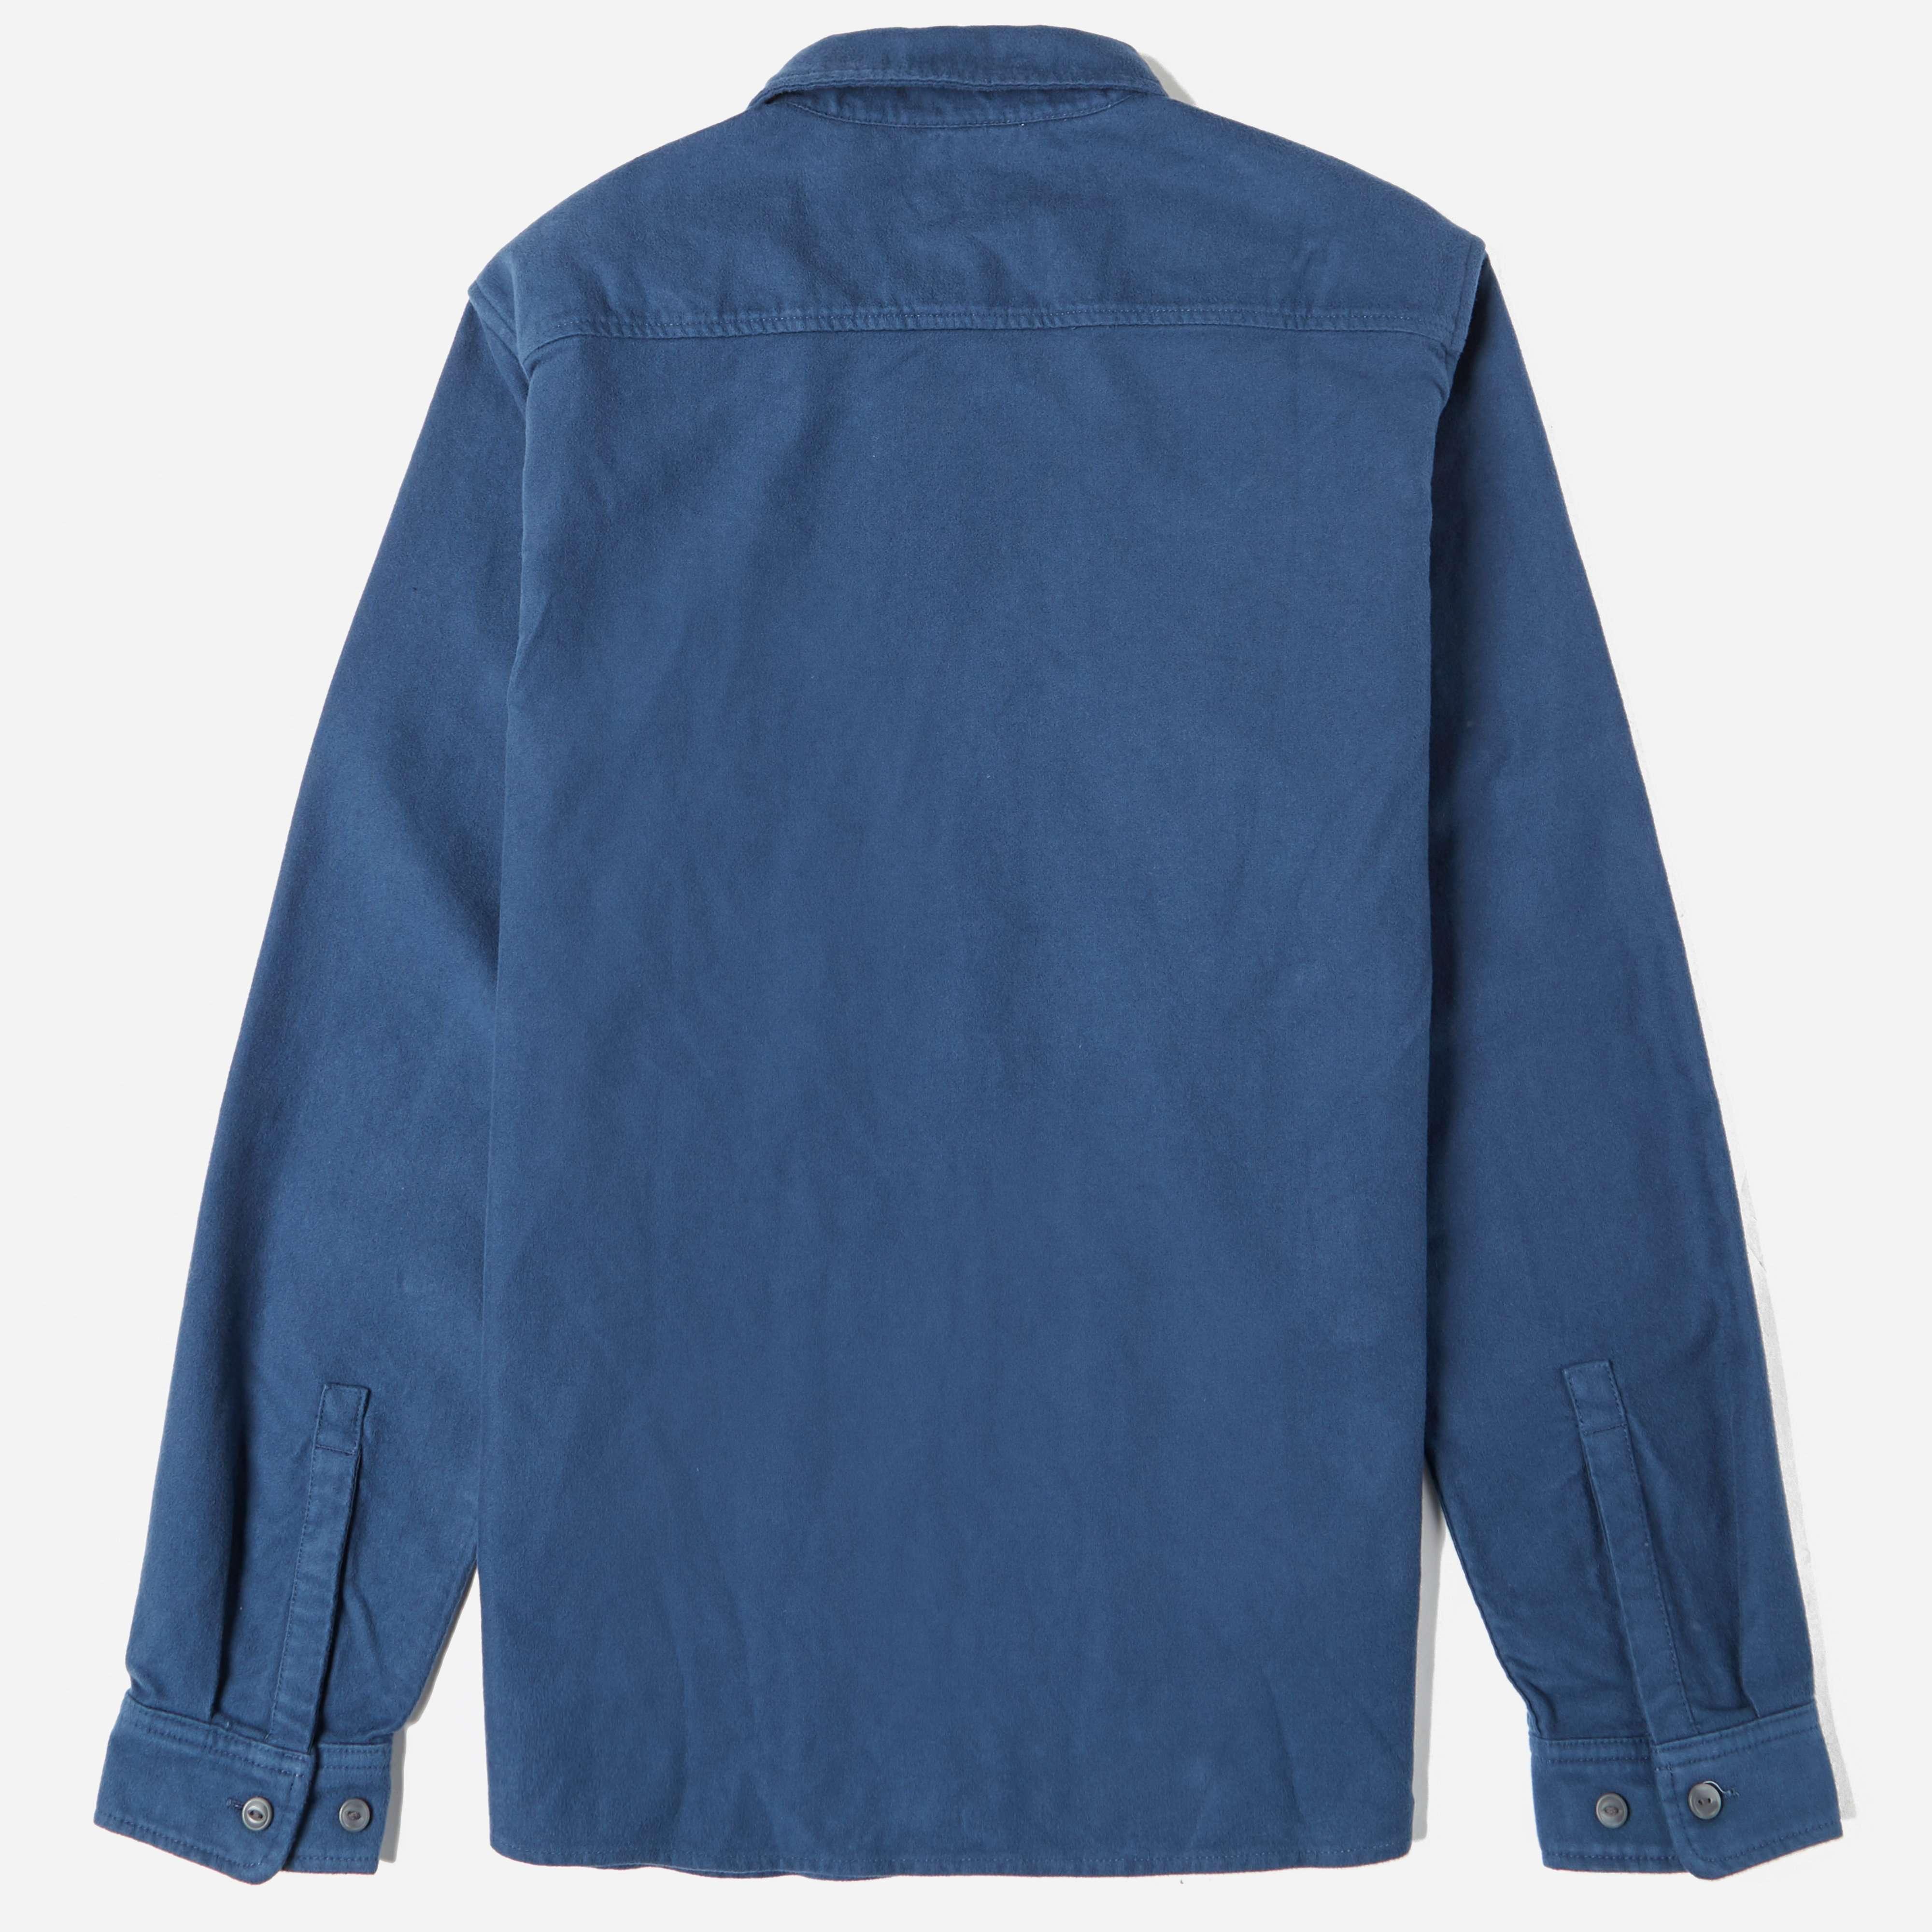 Patagonia Topo Canyon Moleskin Shirt